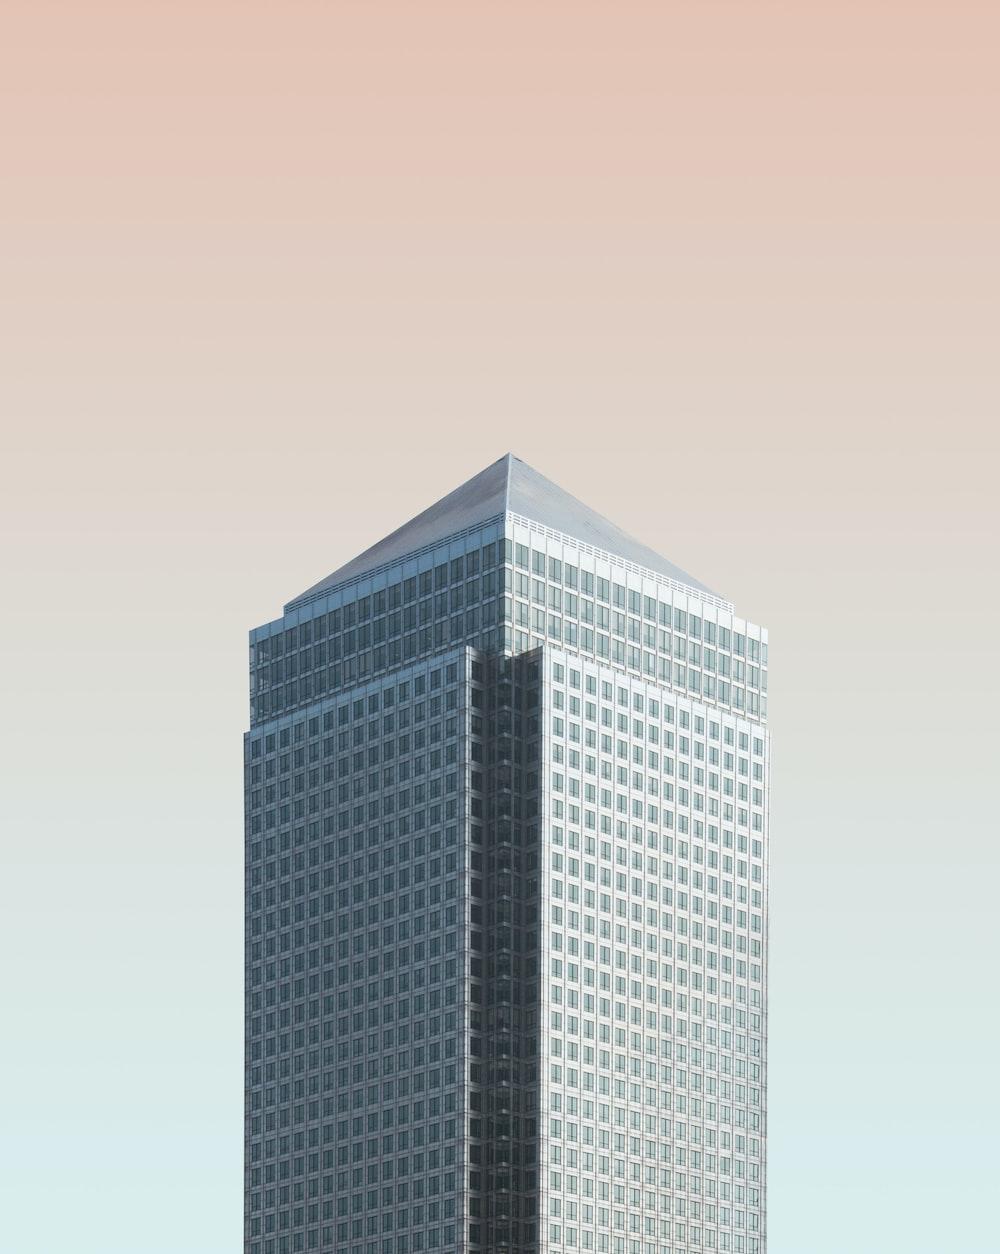 grey high-rise building